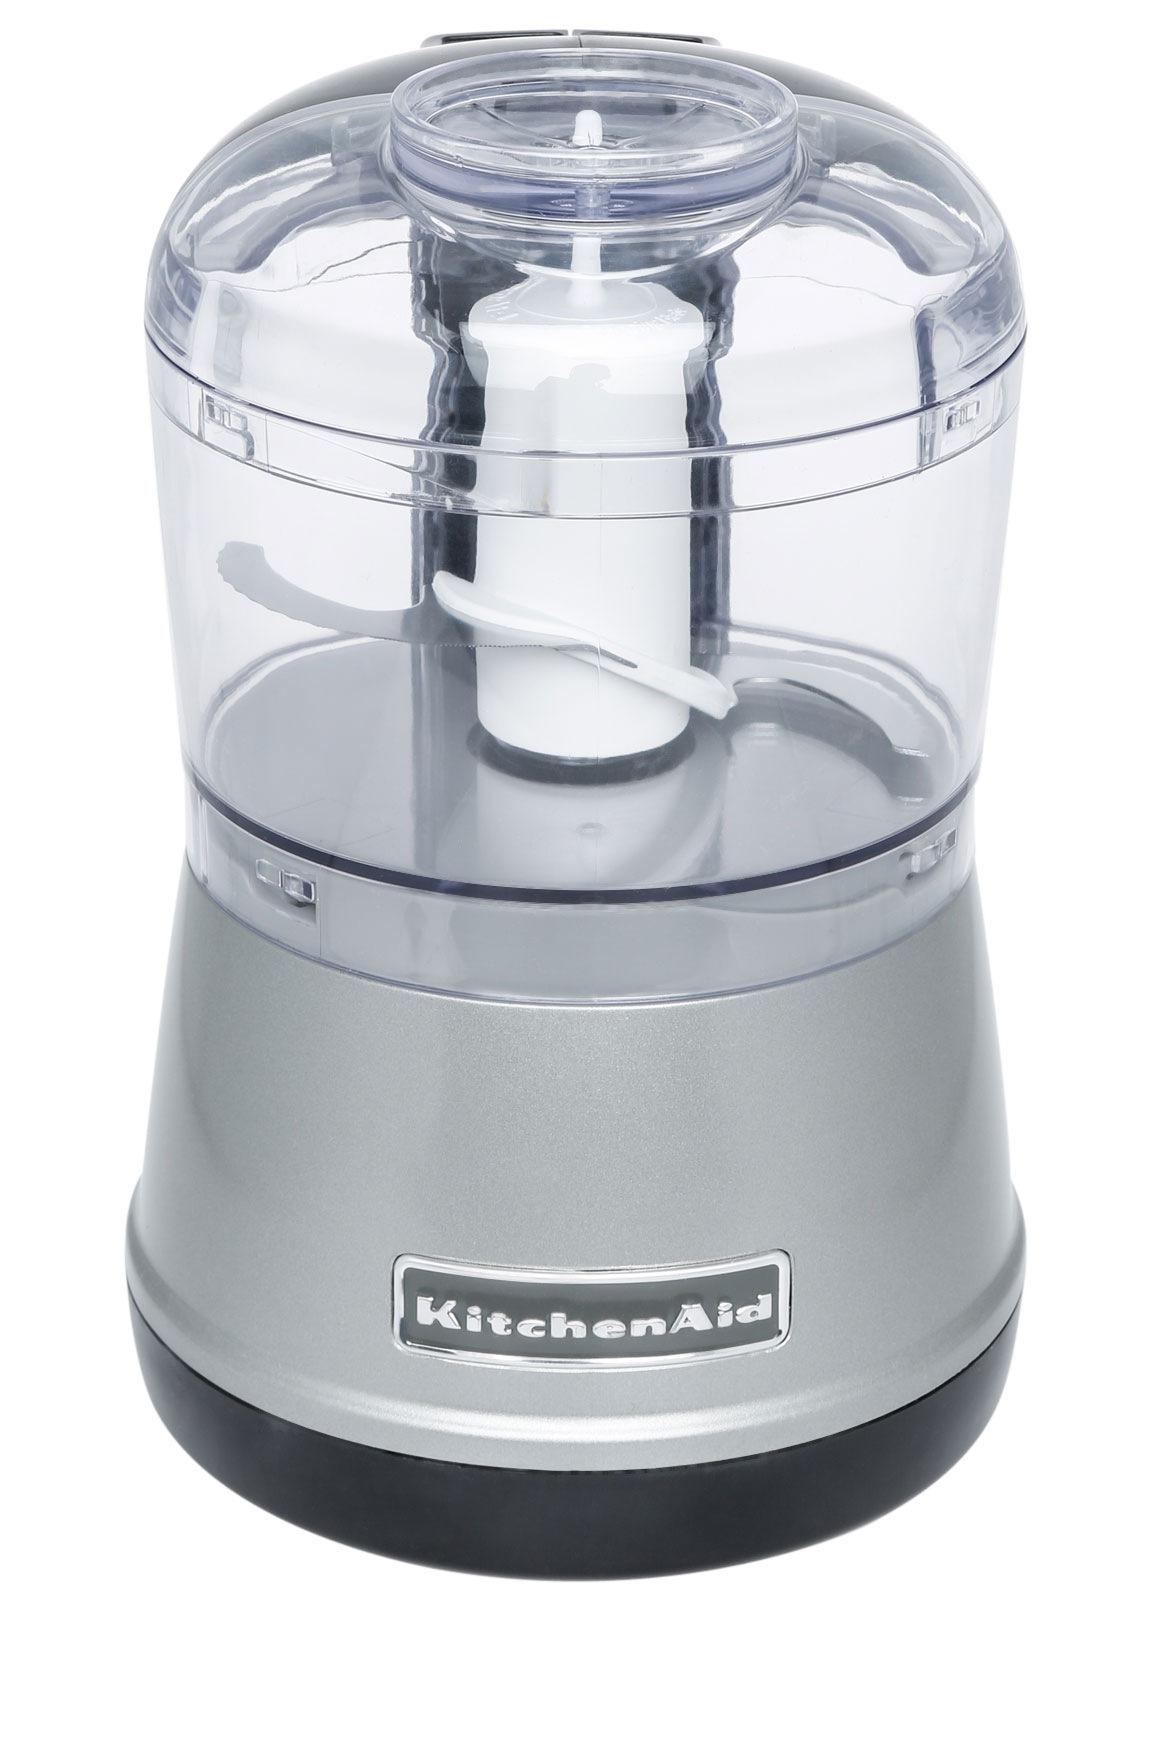 KitchenAid | Artisan Chopper: Silver | Myer Online